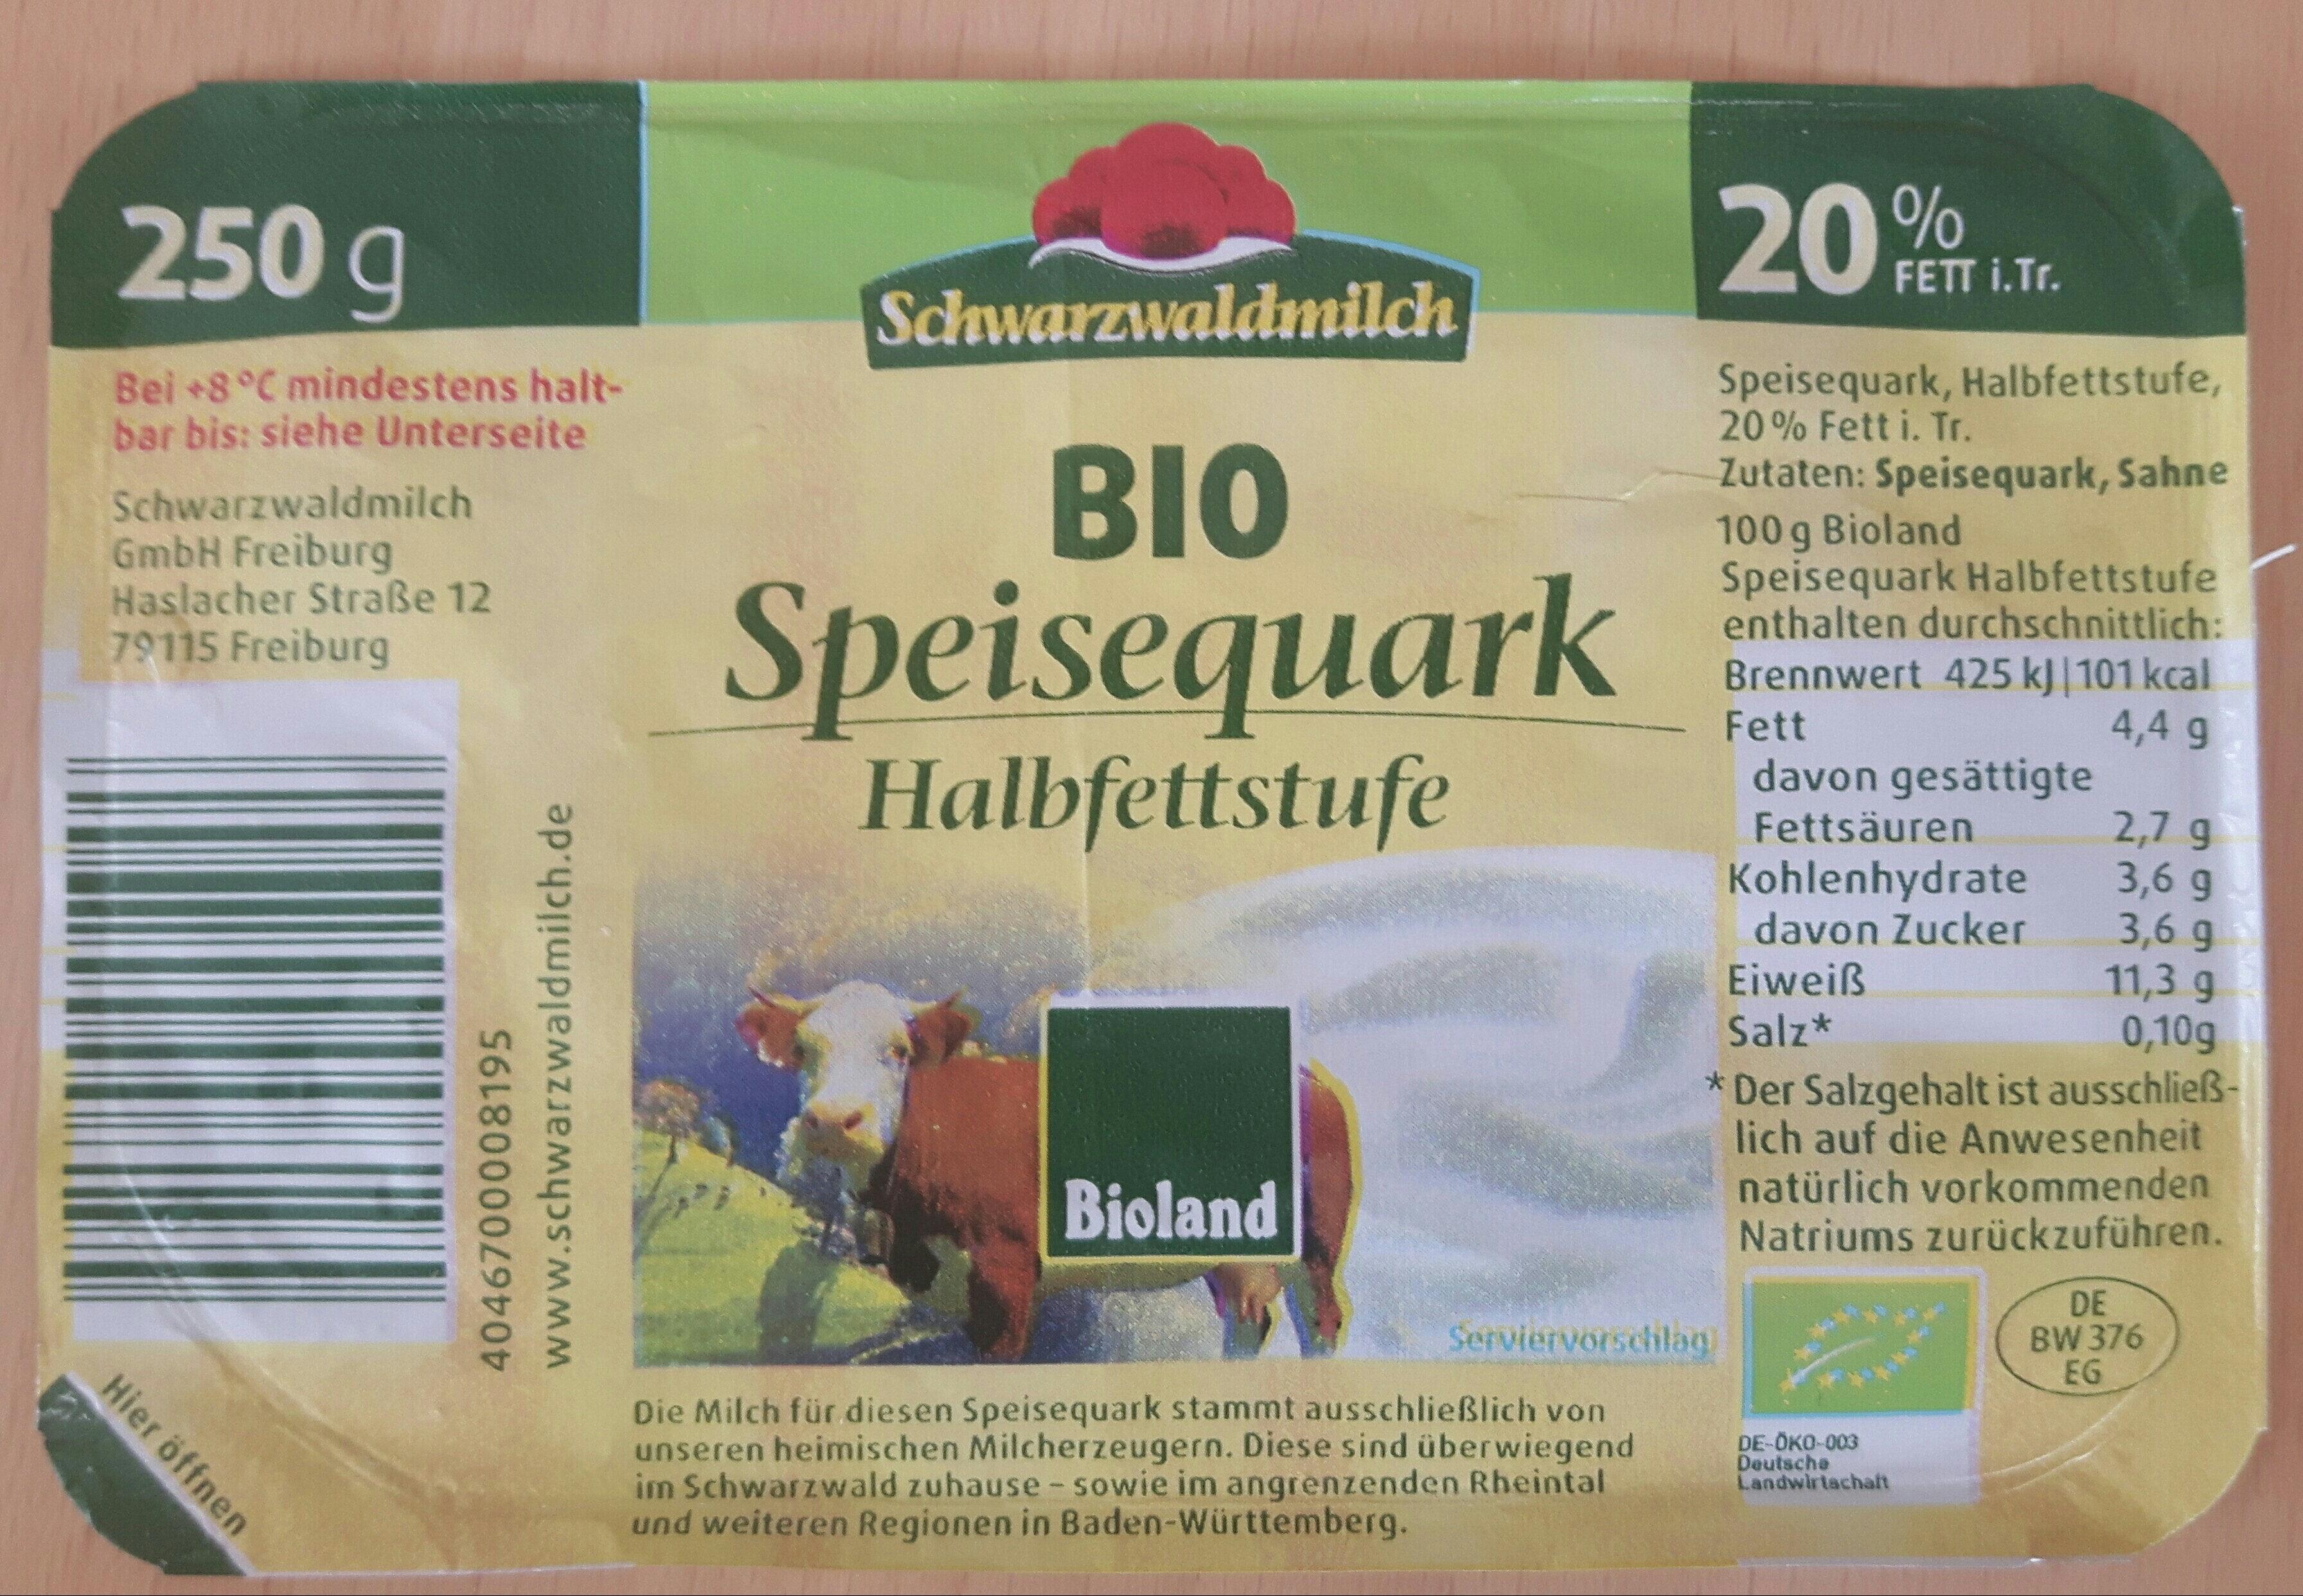 Bio Speisequark Halbfettstufe - Produkt - de